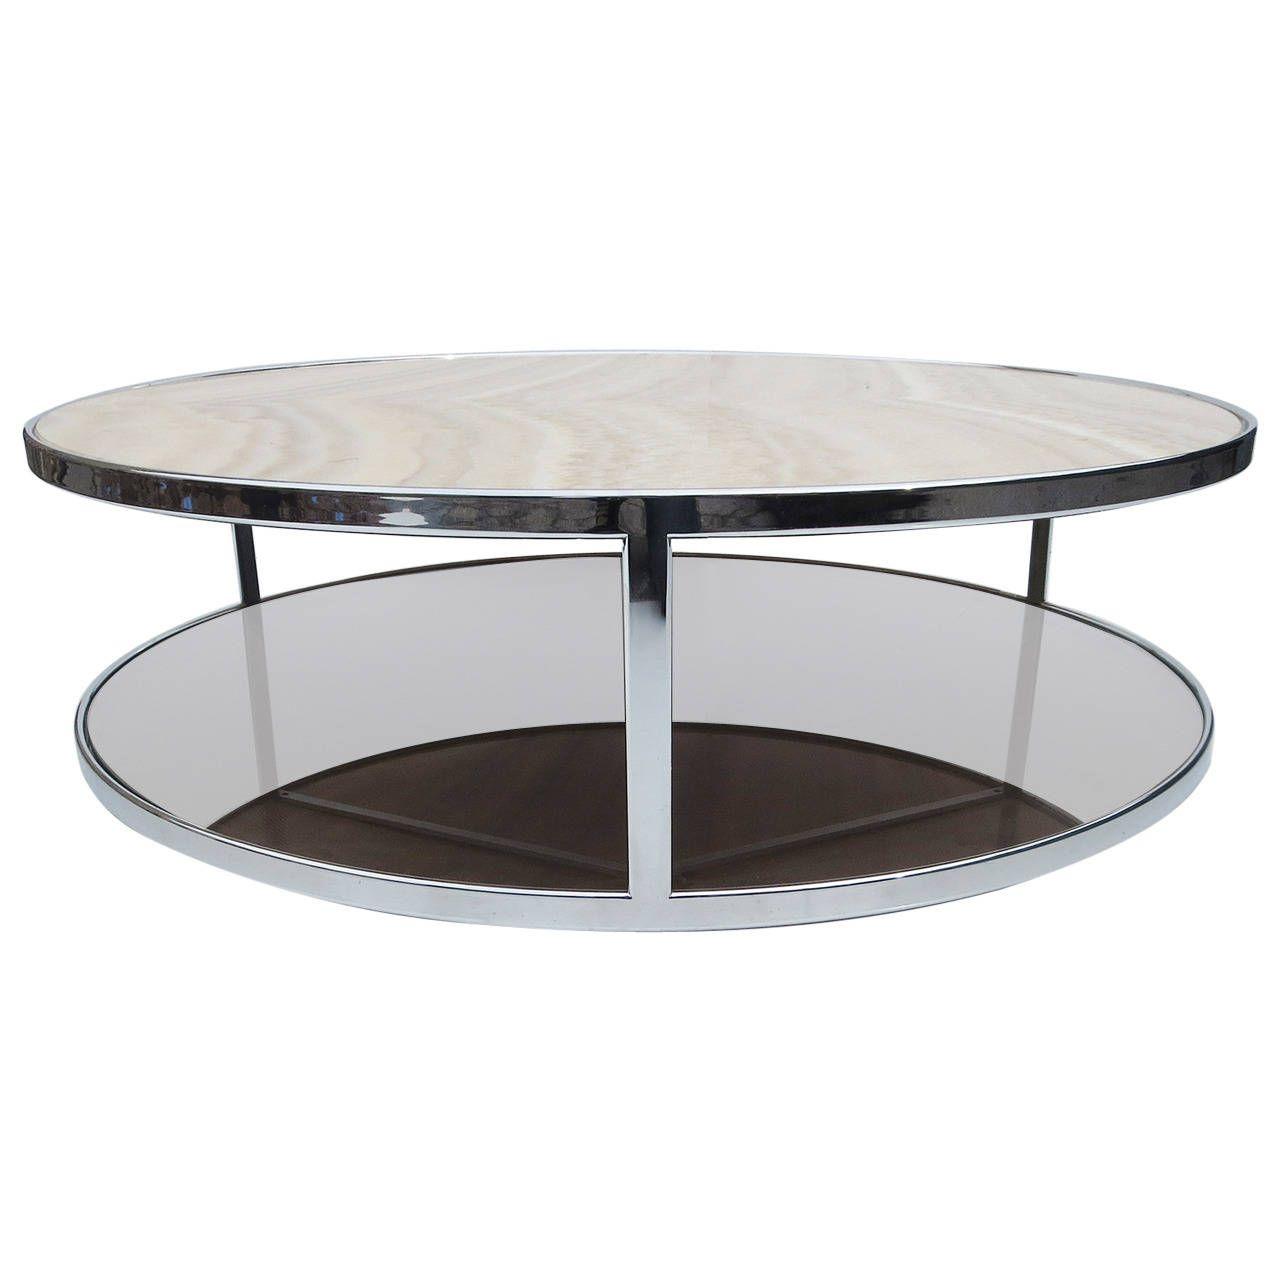 Onyx And Bronzed Glass Coffee Table By Rodolfo Dordoni For Minotti 1stdibs Com Coffee Table Glass Coffee Table Modern Coffee Tables [ 1280 x 1280 Pixel ]